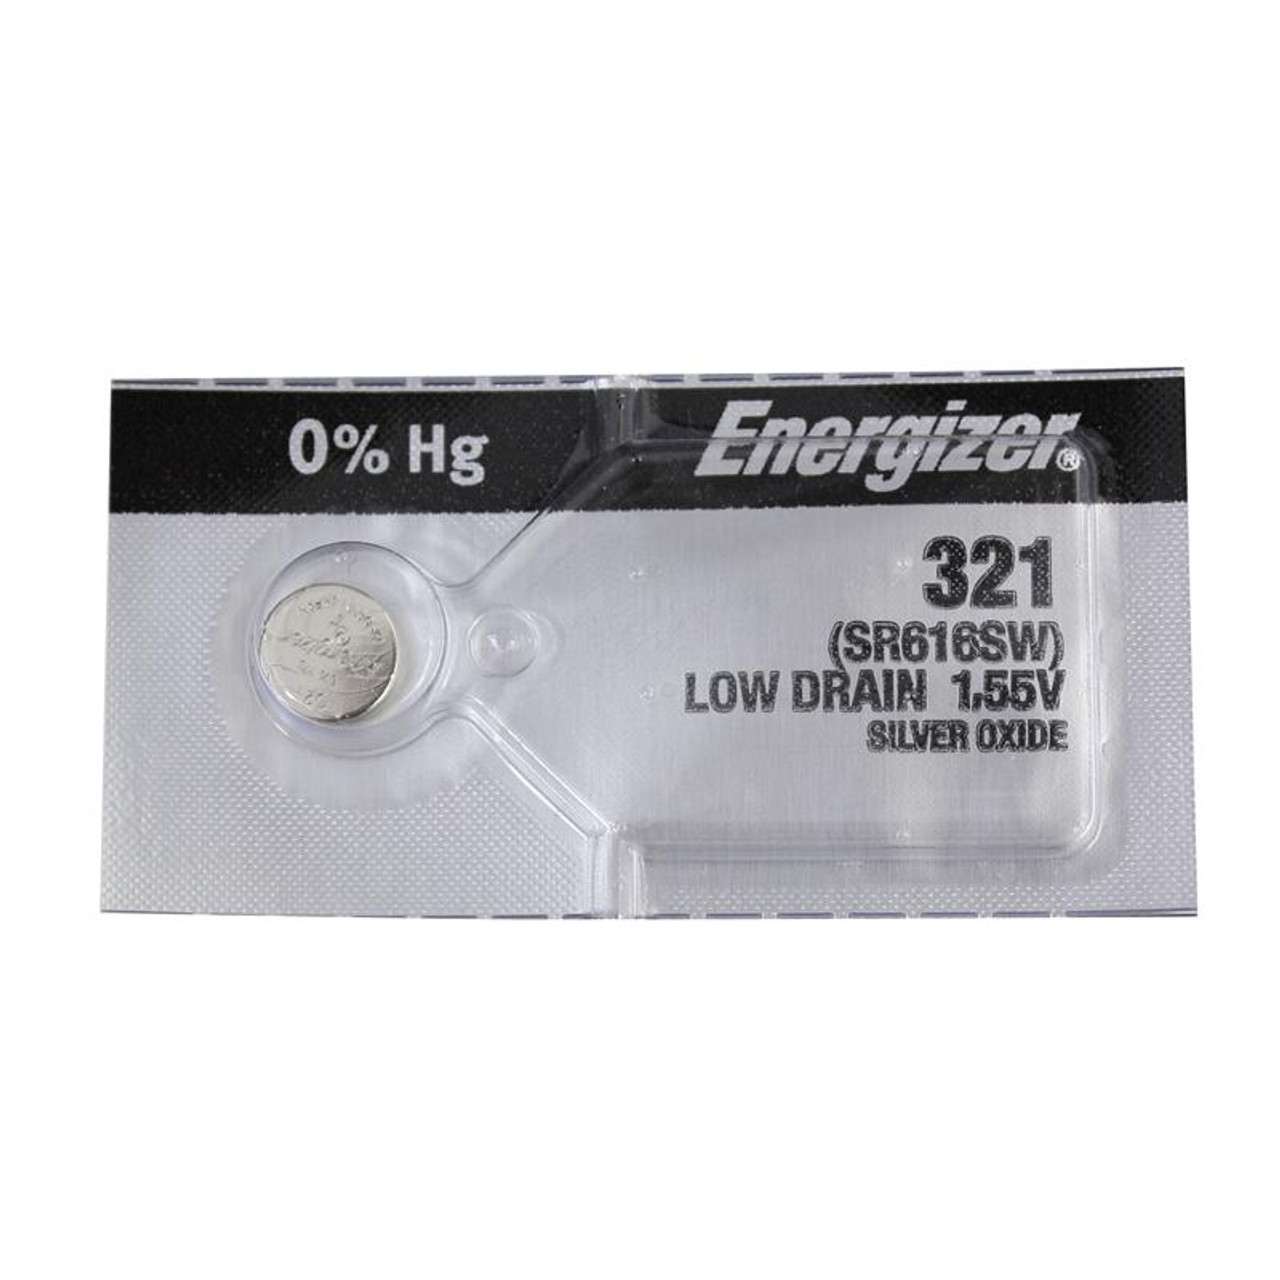 Energizer 321